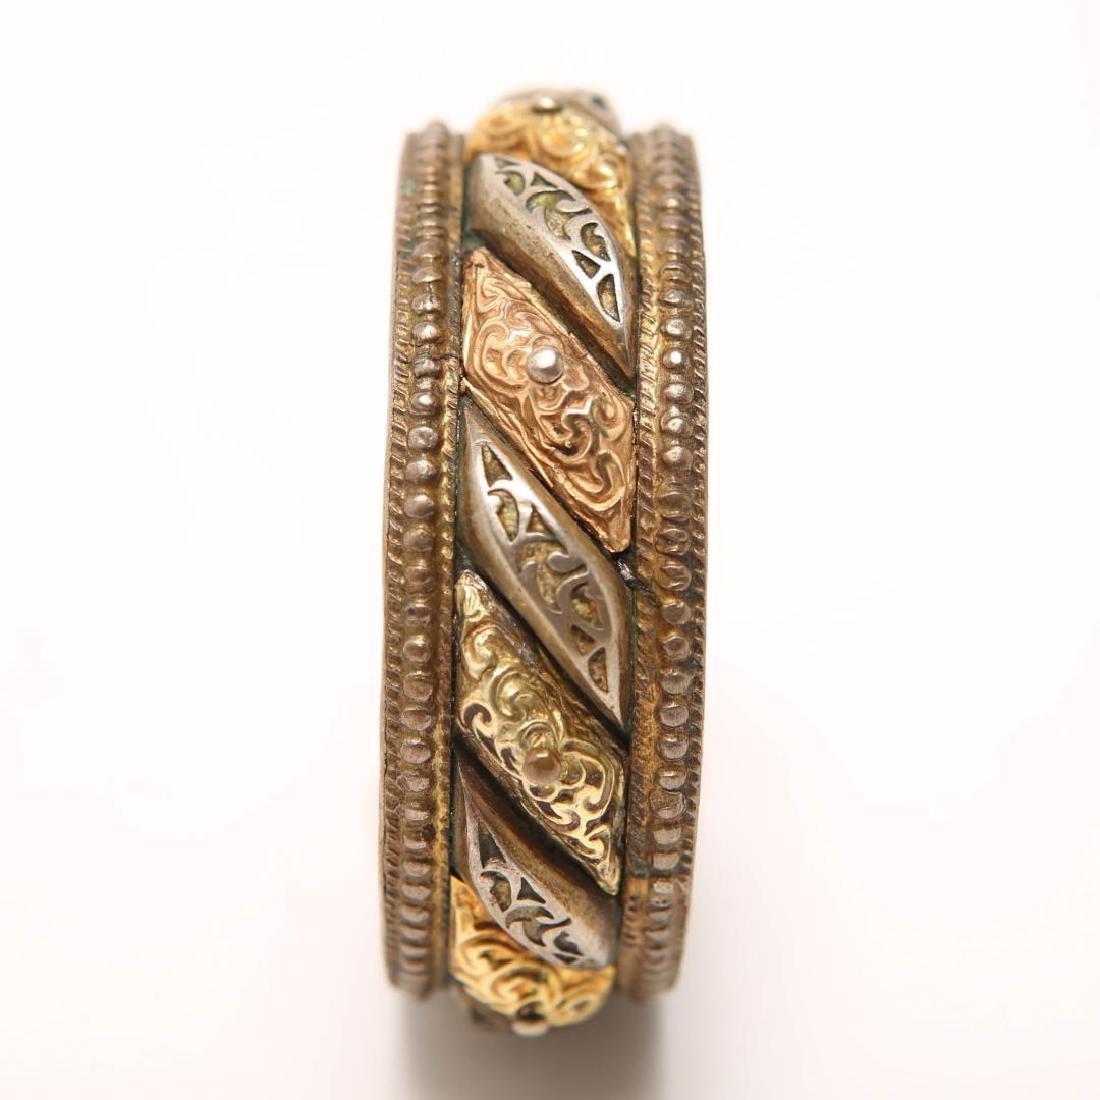 Renaissance-Revival Silver Bangle w. Applied Gold - 4